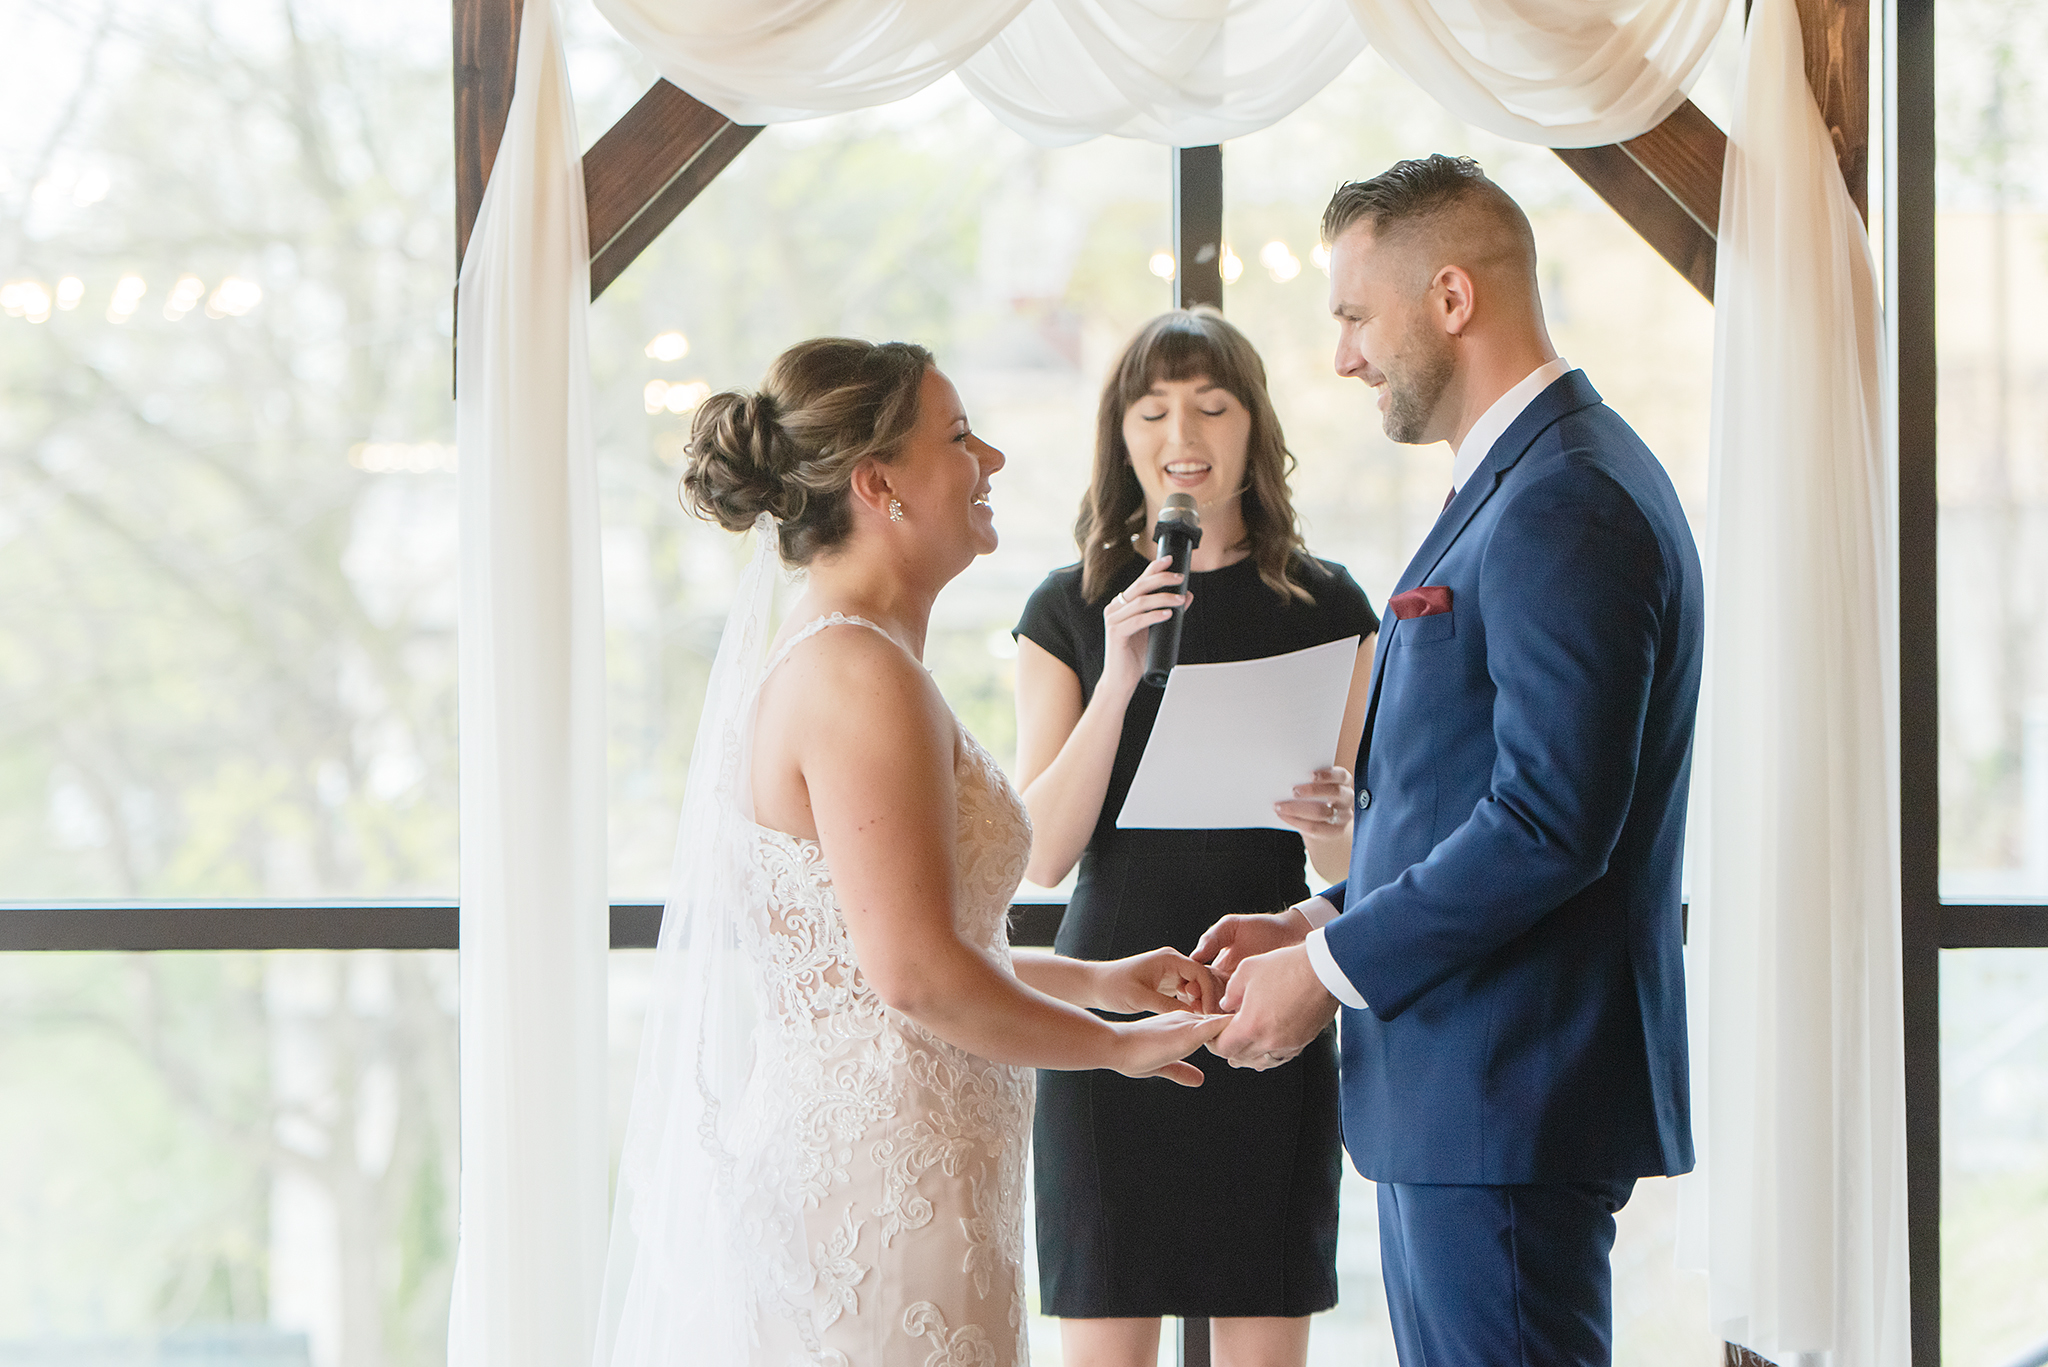 LINDSAY-ADKINS-PHOTOGRAPHY-MICHIGAN-WEDDING-PHOTOGRAPHER-FRANKENMUTH-BREWERY-WEDDING-MICHIGAN-BLOG-25